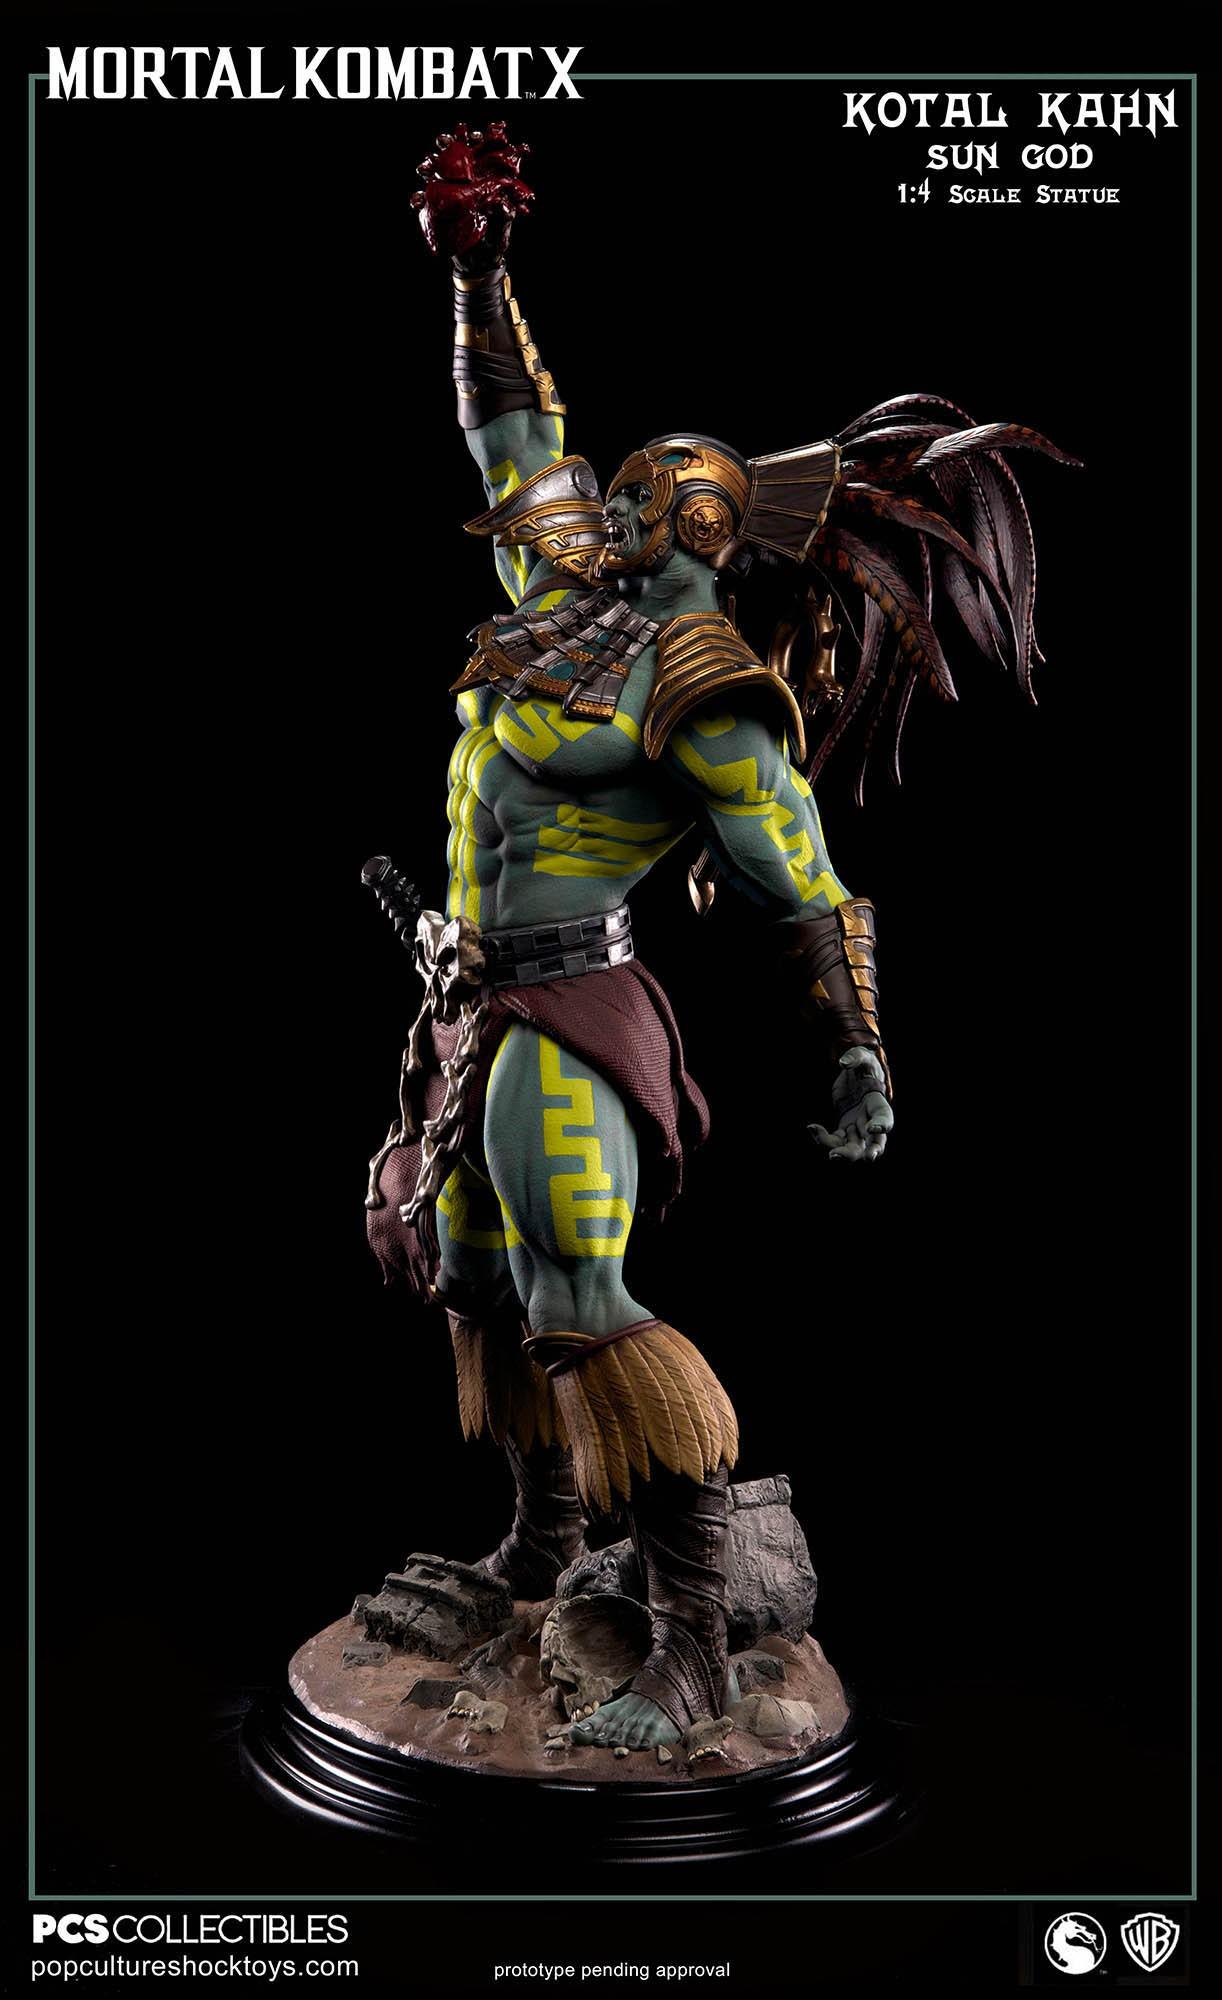 [Pop Culture Shock] Mortal Kombat X: Kotal Kahn 1:4 scale PCS-Kotal-Kahn-Sun-God-014